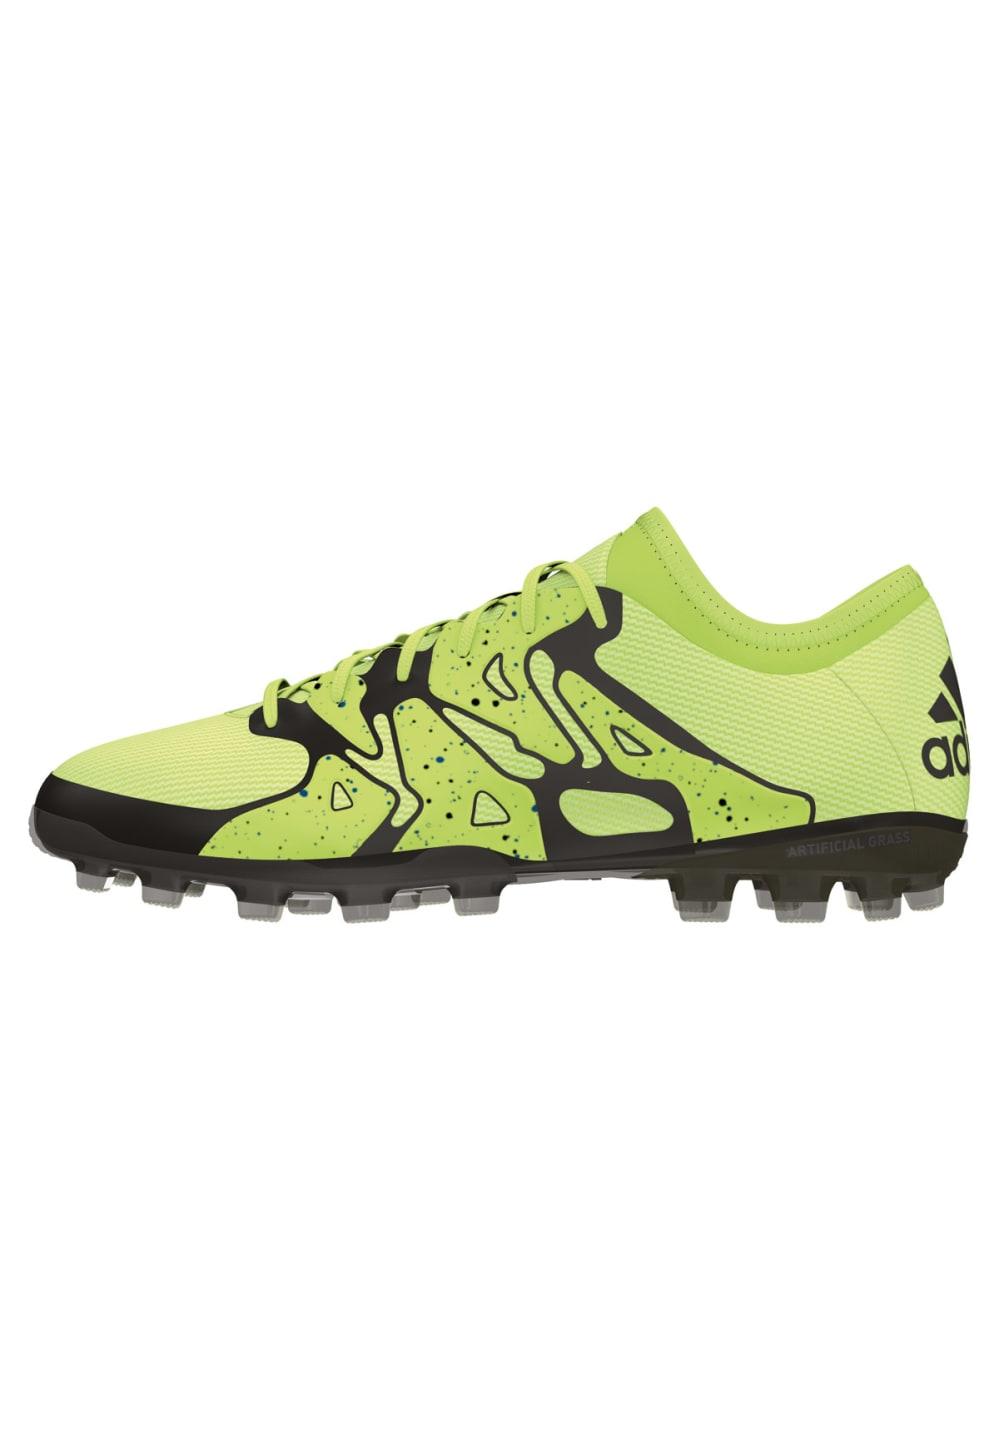 san francisco 8fe9c b66e6 adidas X 15.1 AG - Football Shoes - Green